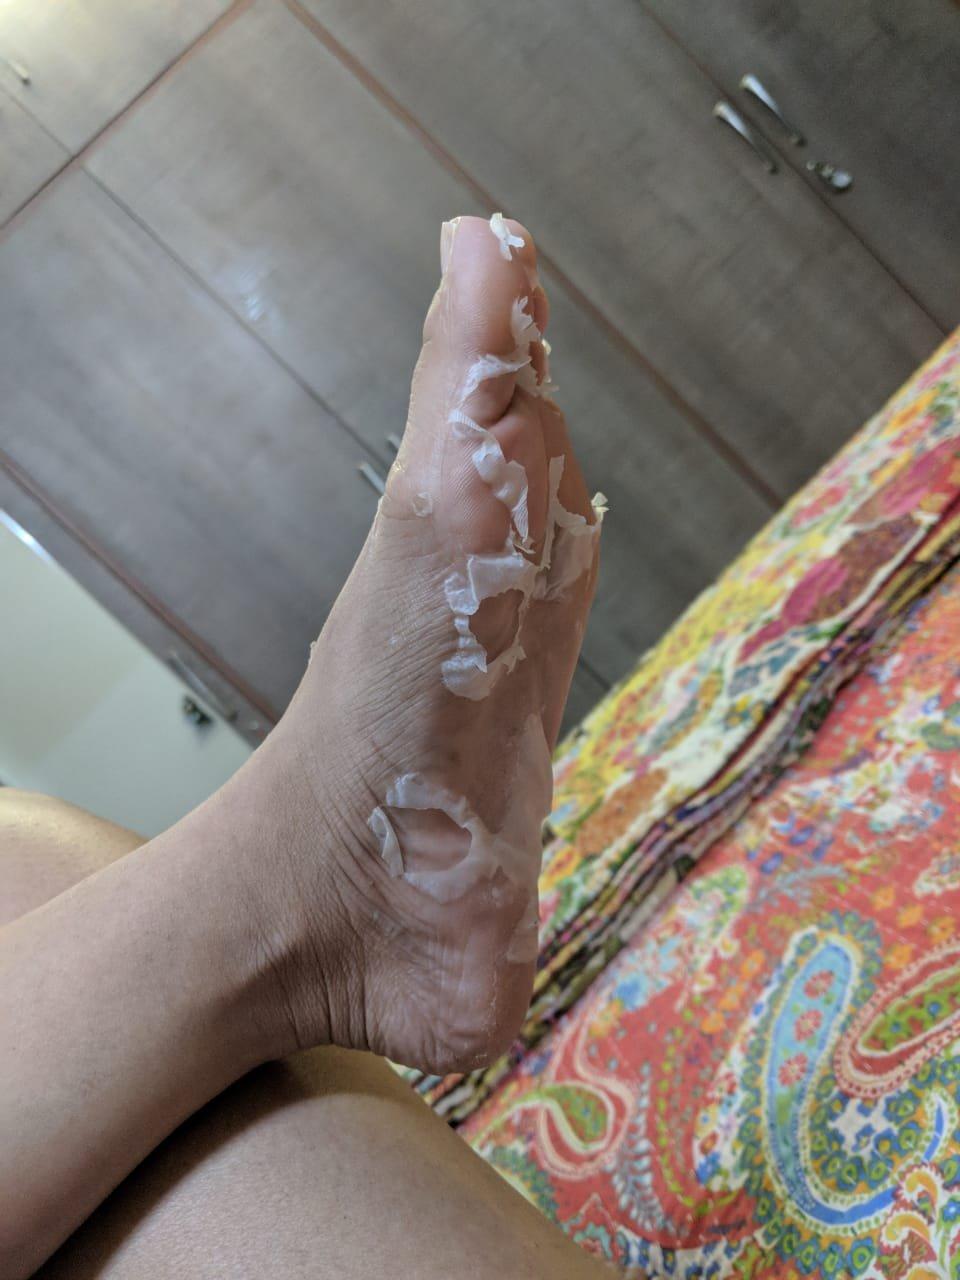 I Tried This Trending Korean Foot Peel